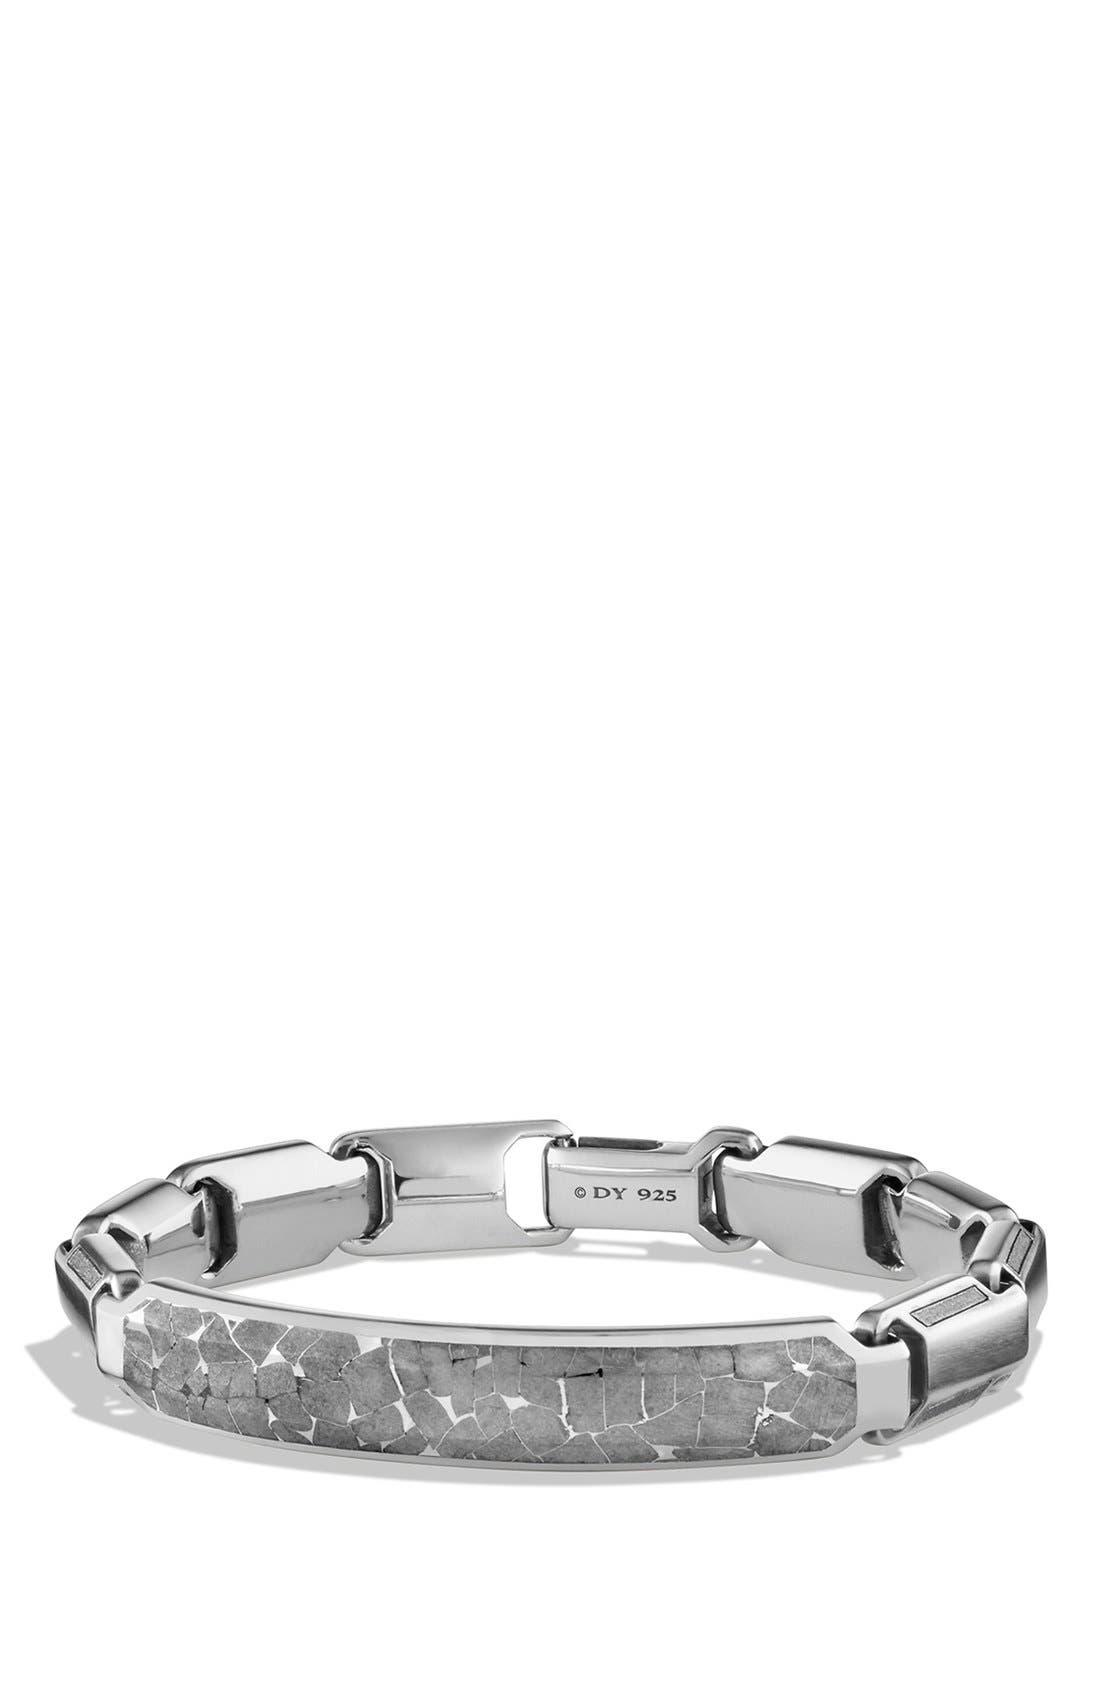 Main Image - David Yurman 'Meteorite' Fused ID Bracelet